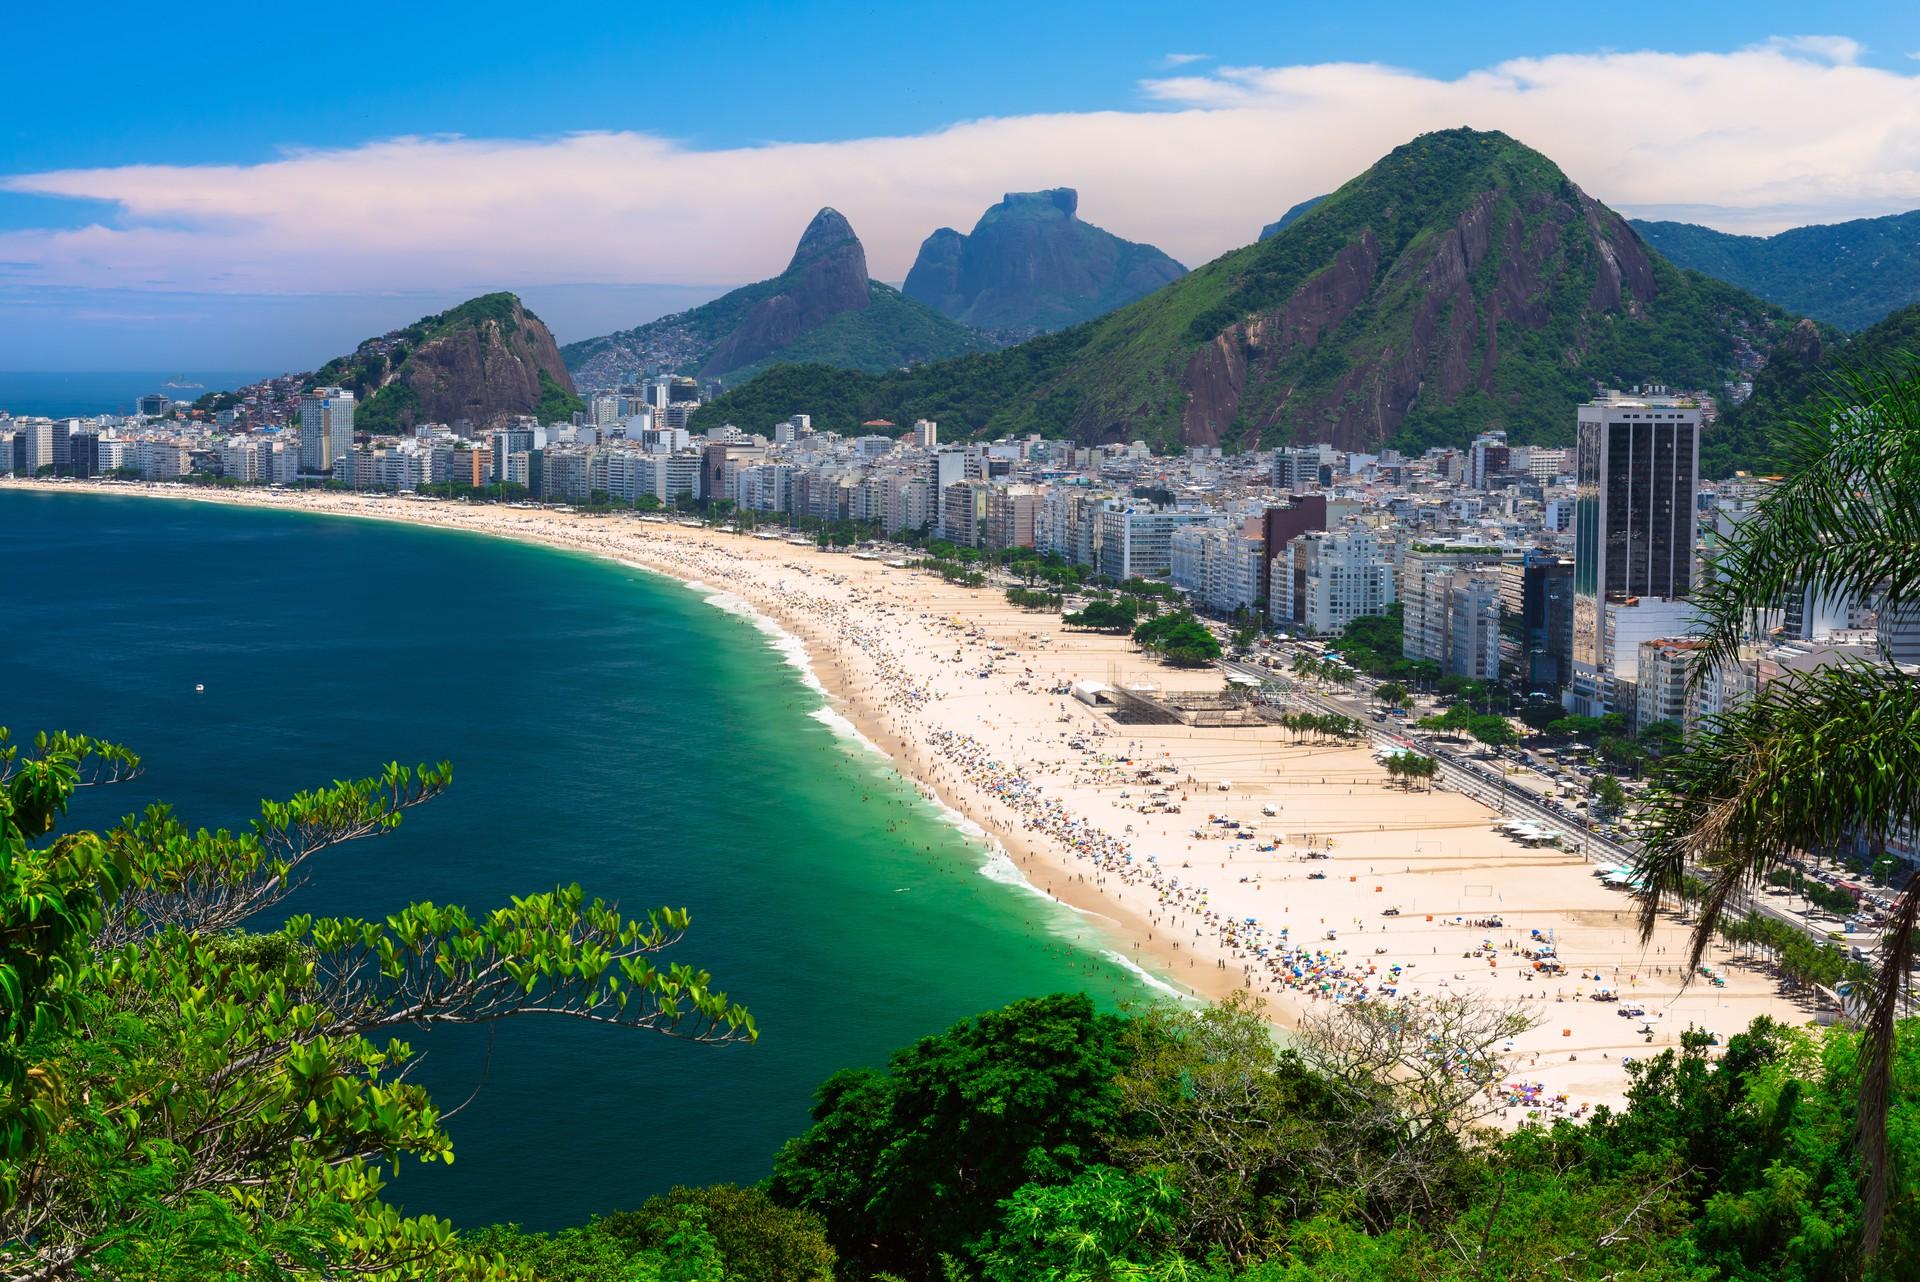 Brazil Rio de Janeiro beach